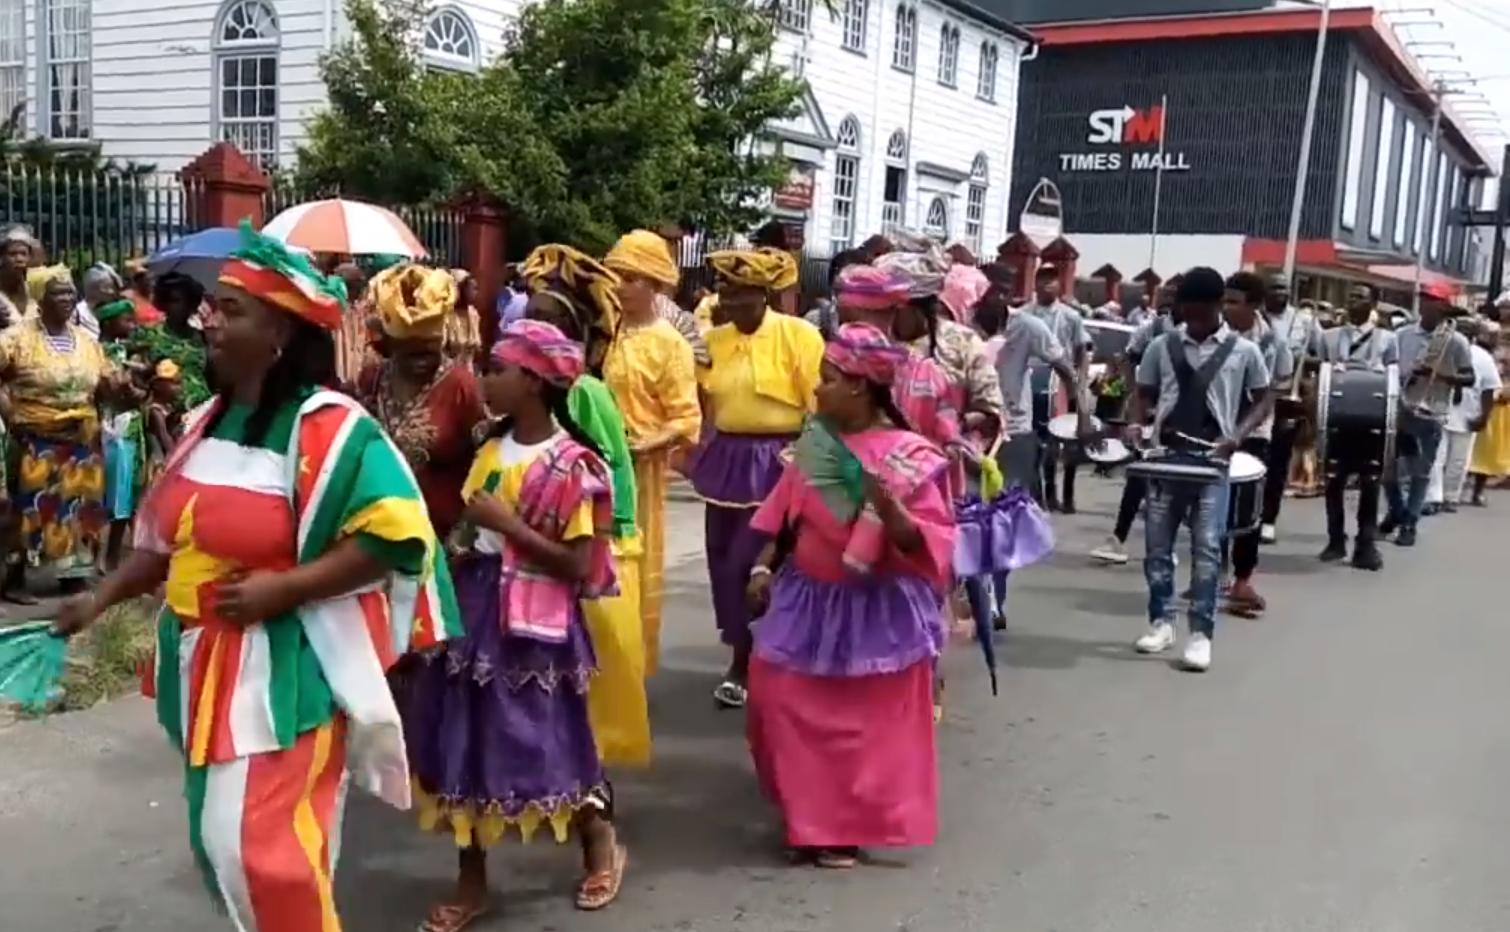 Bigi_spikri,_Suriname,_2018_-_1